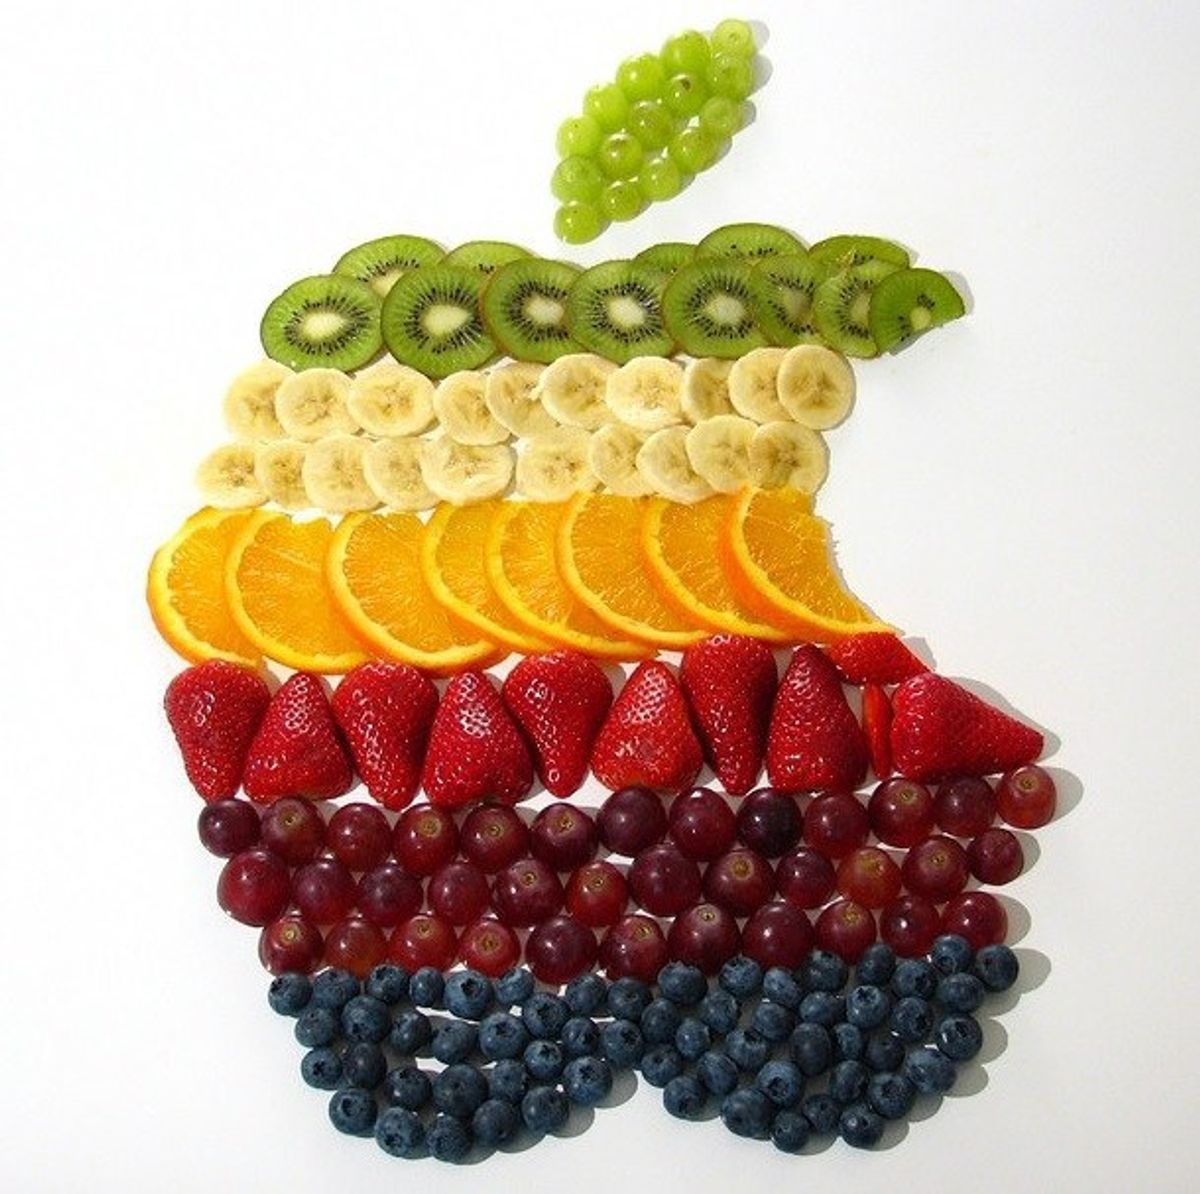 8 Healthy On-The-Go Snacks For Summertime